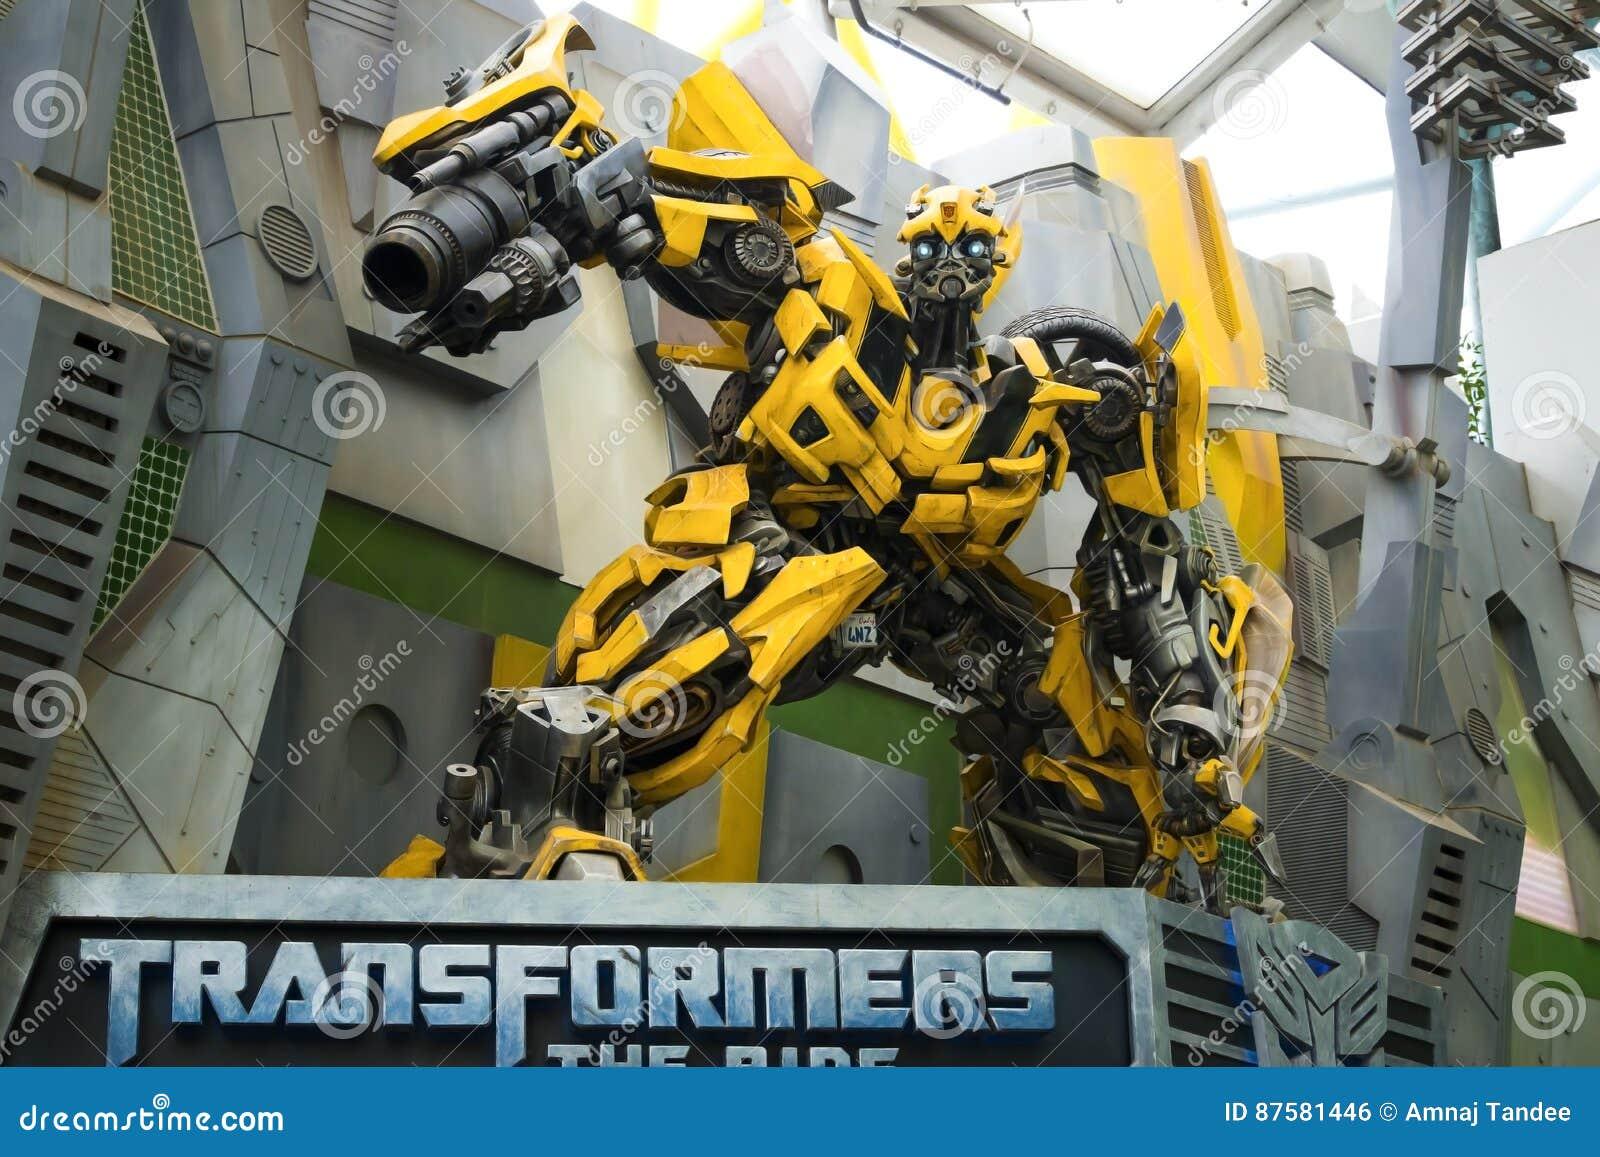 UNIVERSAL STUDIOS SINGAPORE - FEBRUARY 2 2017 : TRANSFORMERS model at Universal Studios Singapore